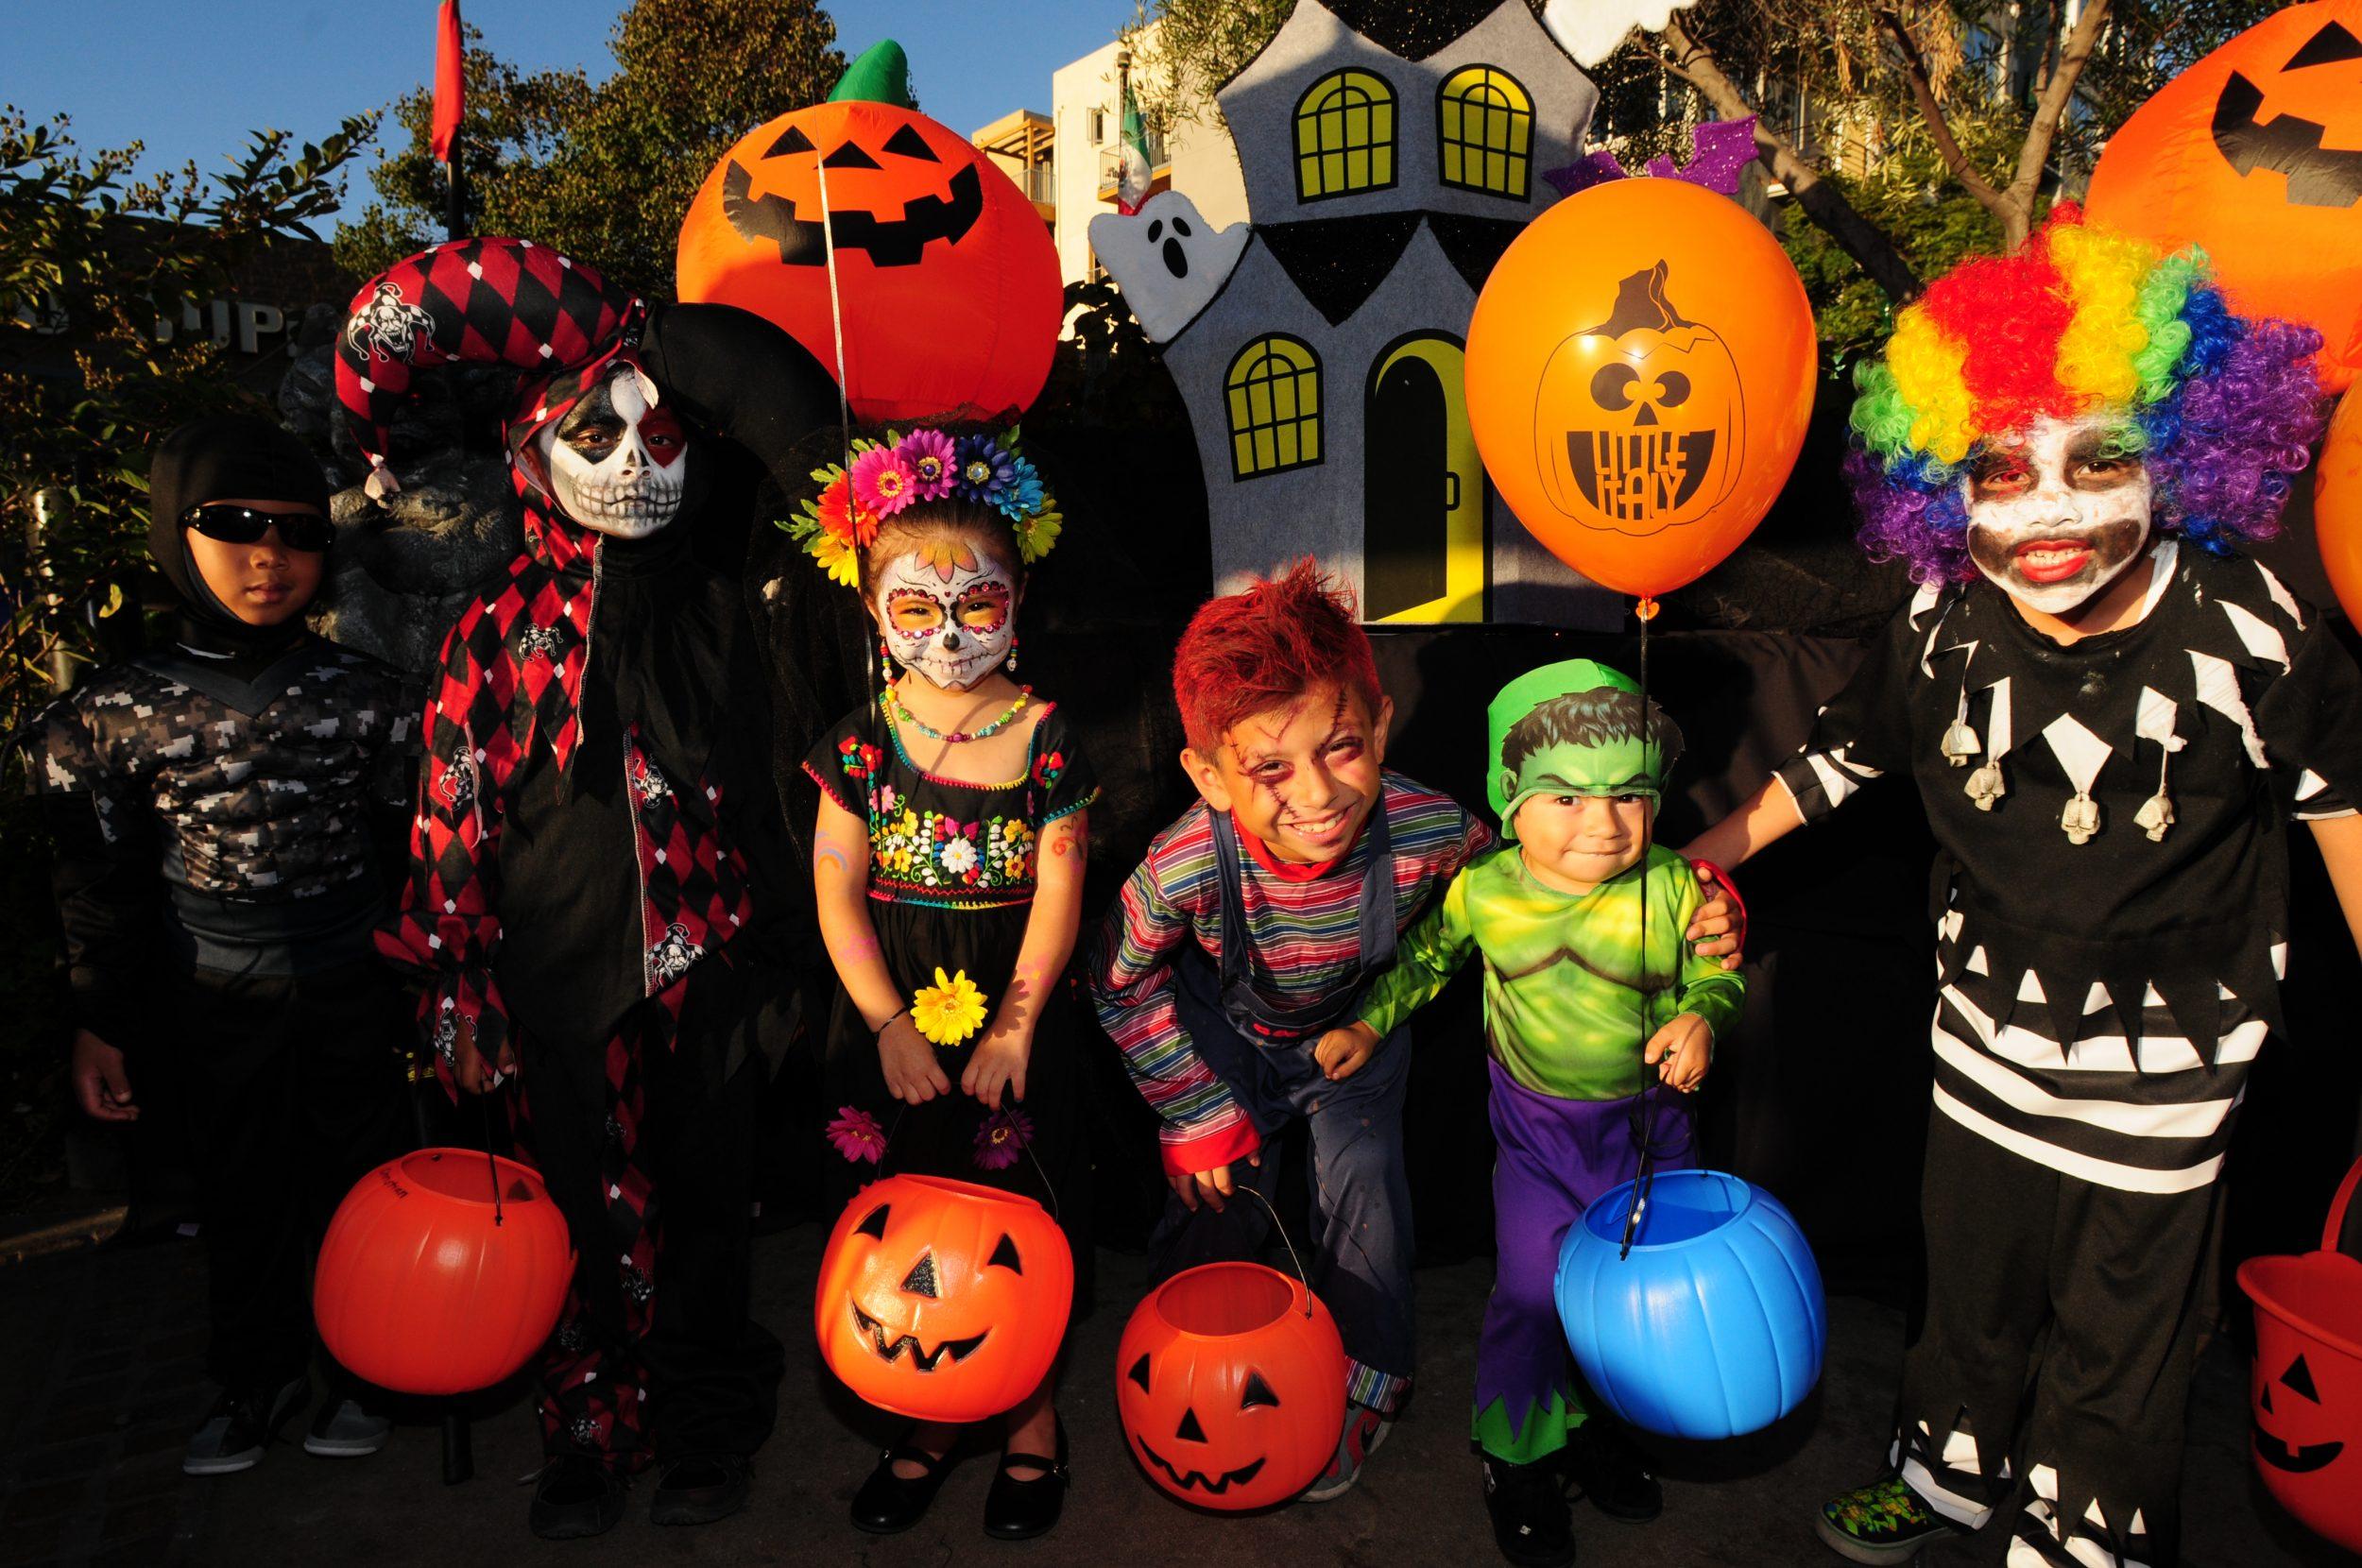 West Seattle Kid Halloween 2020 Best Trick or Treat Spots and Halloween Activities in Seattle, WA